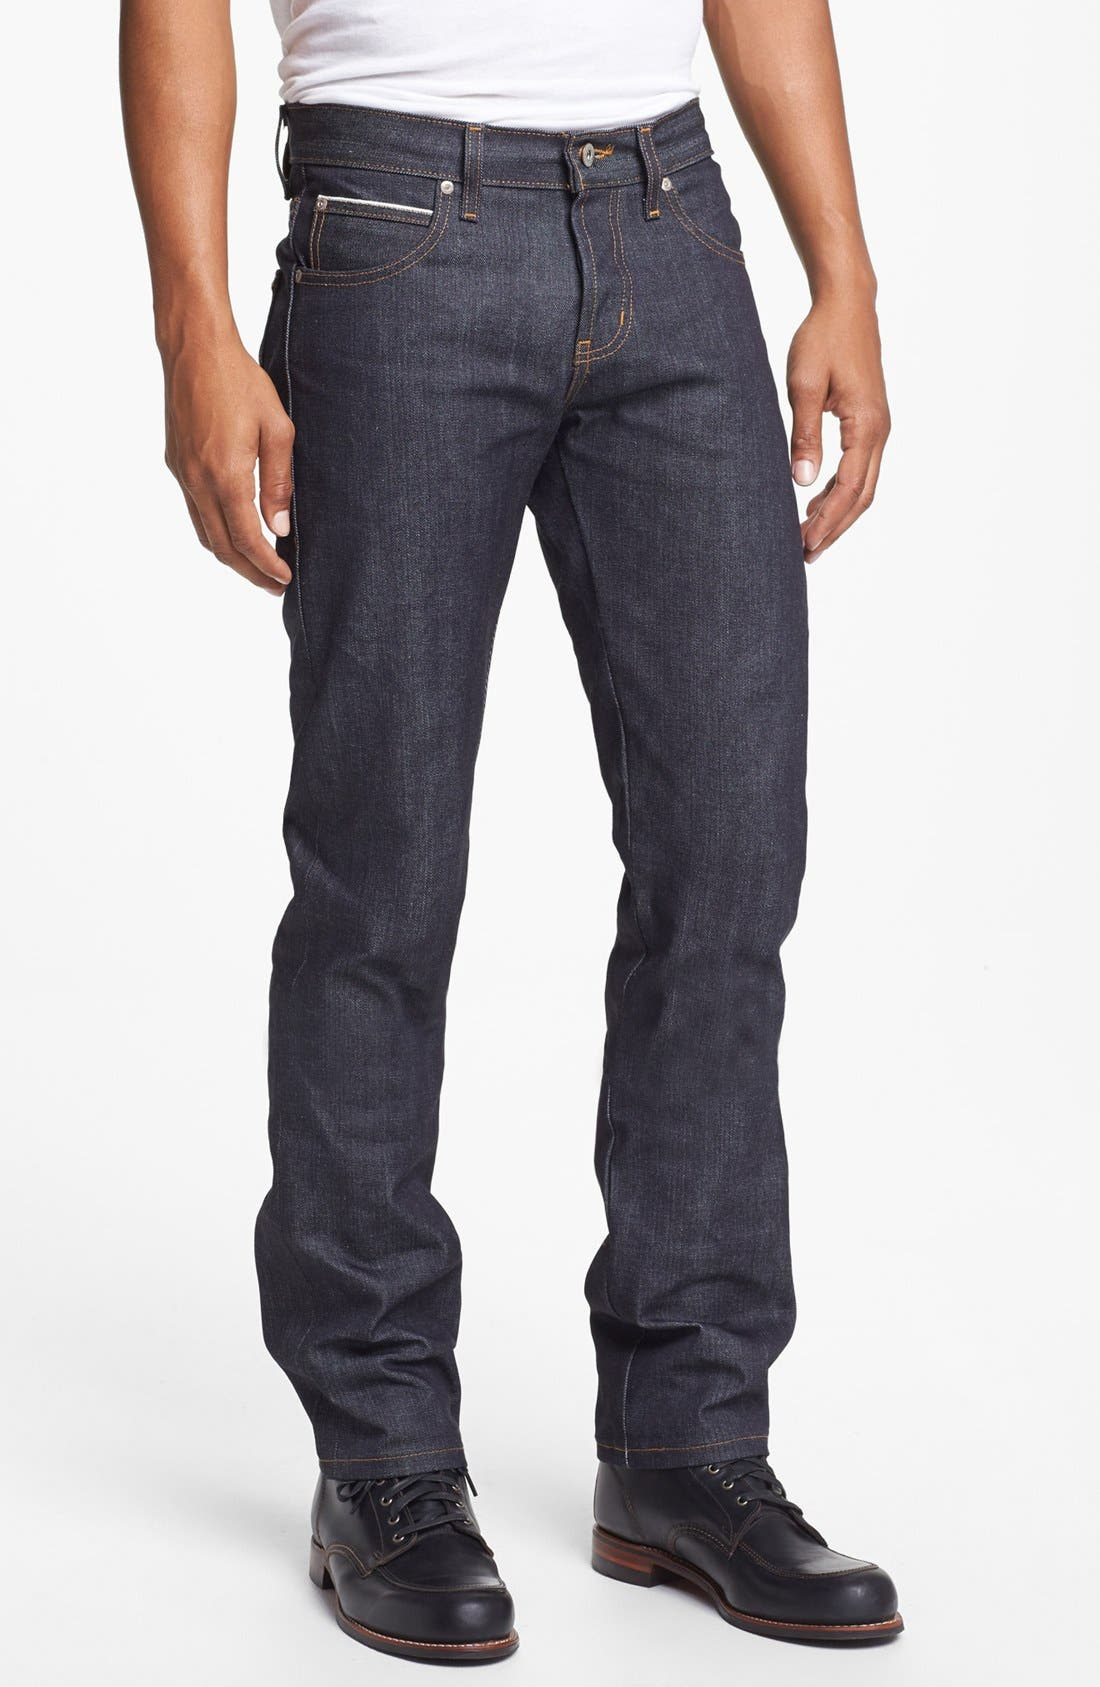 NAKED & FAMOUS DENIM Skinny Guy Skinny Fit Raw Selvedge Jeans